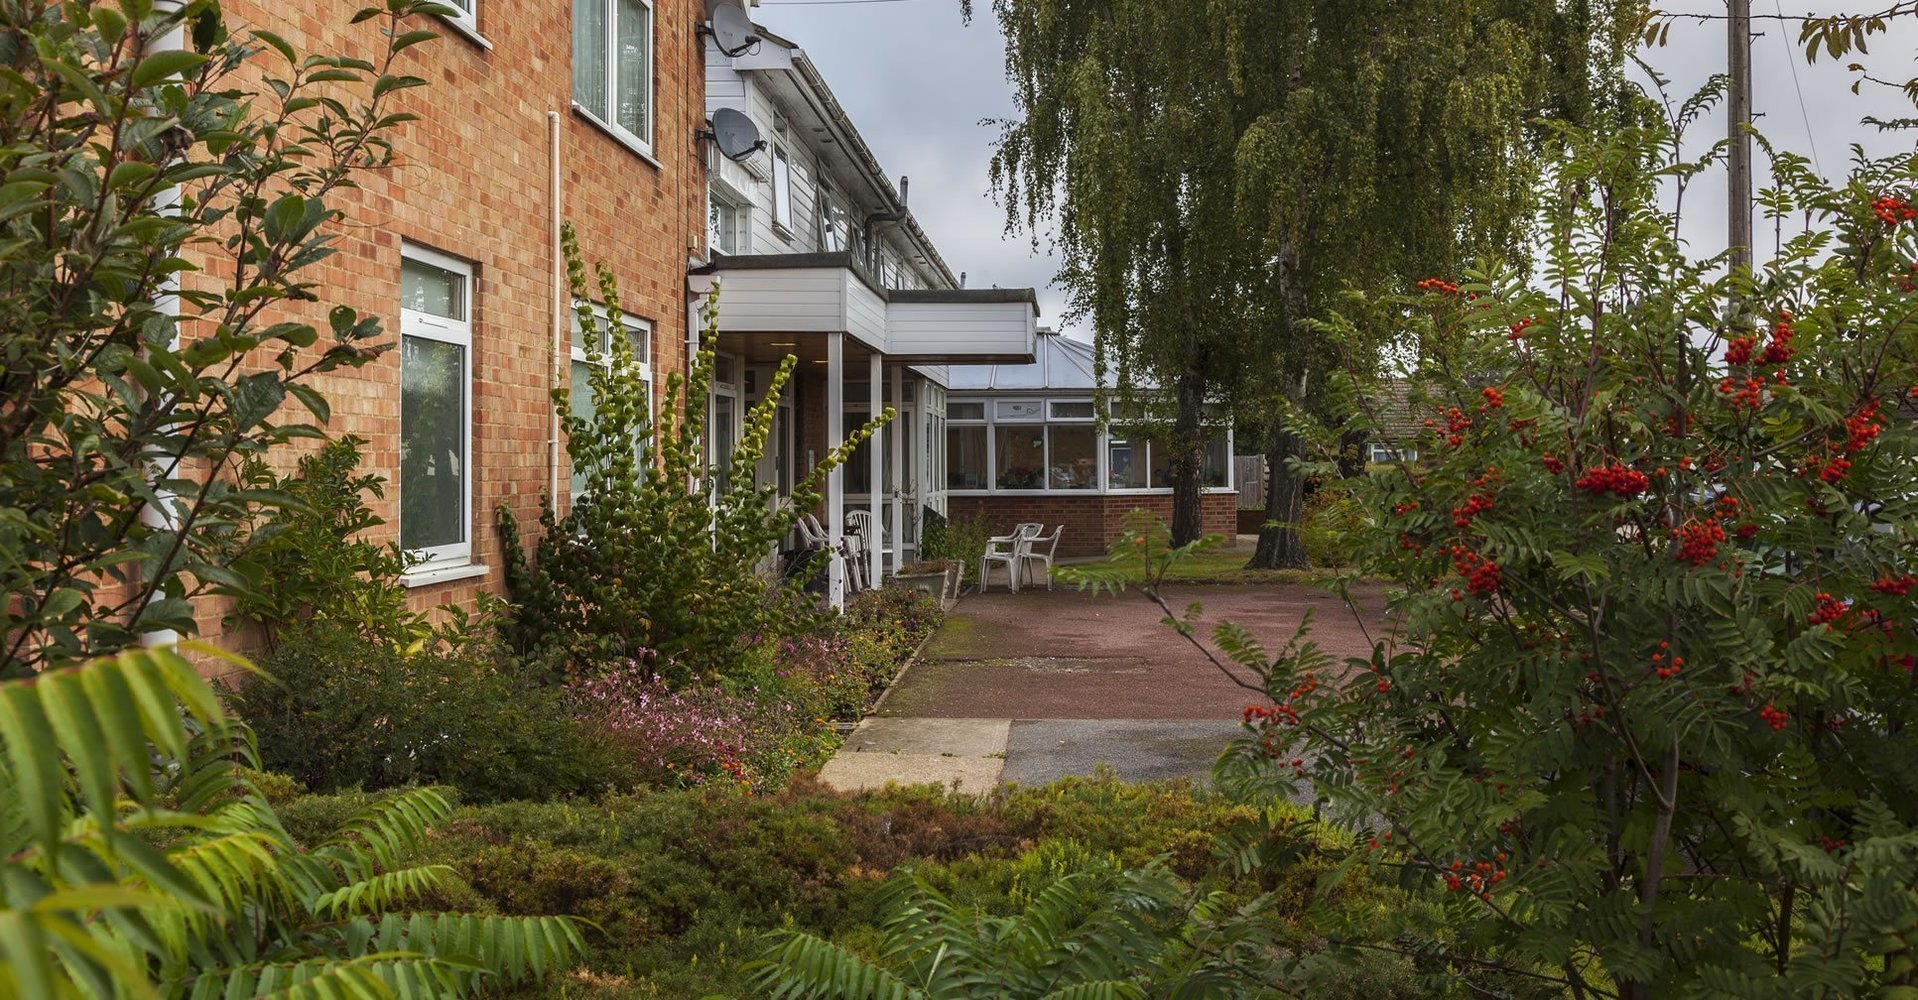 Heybridge Care Home